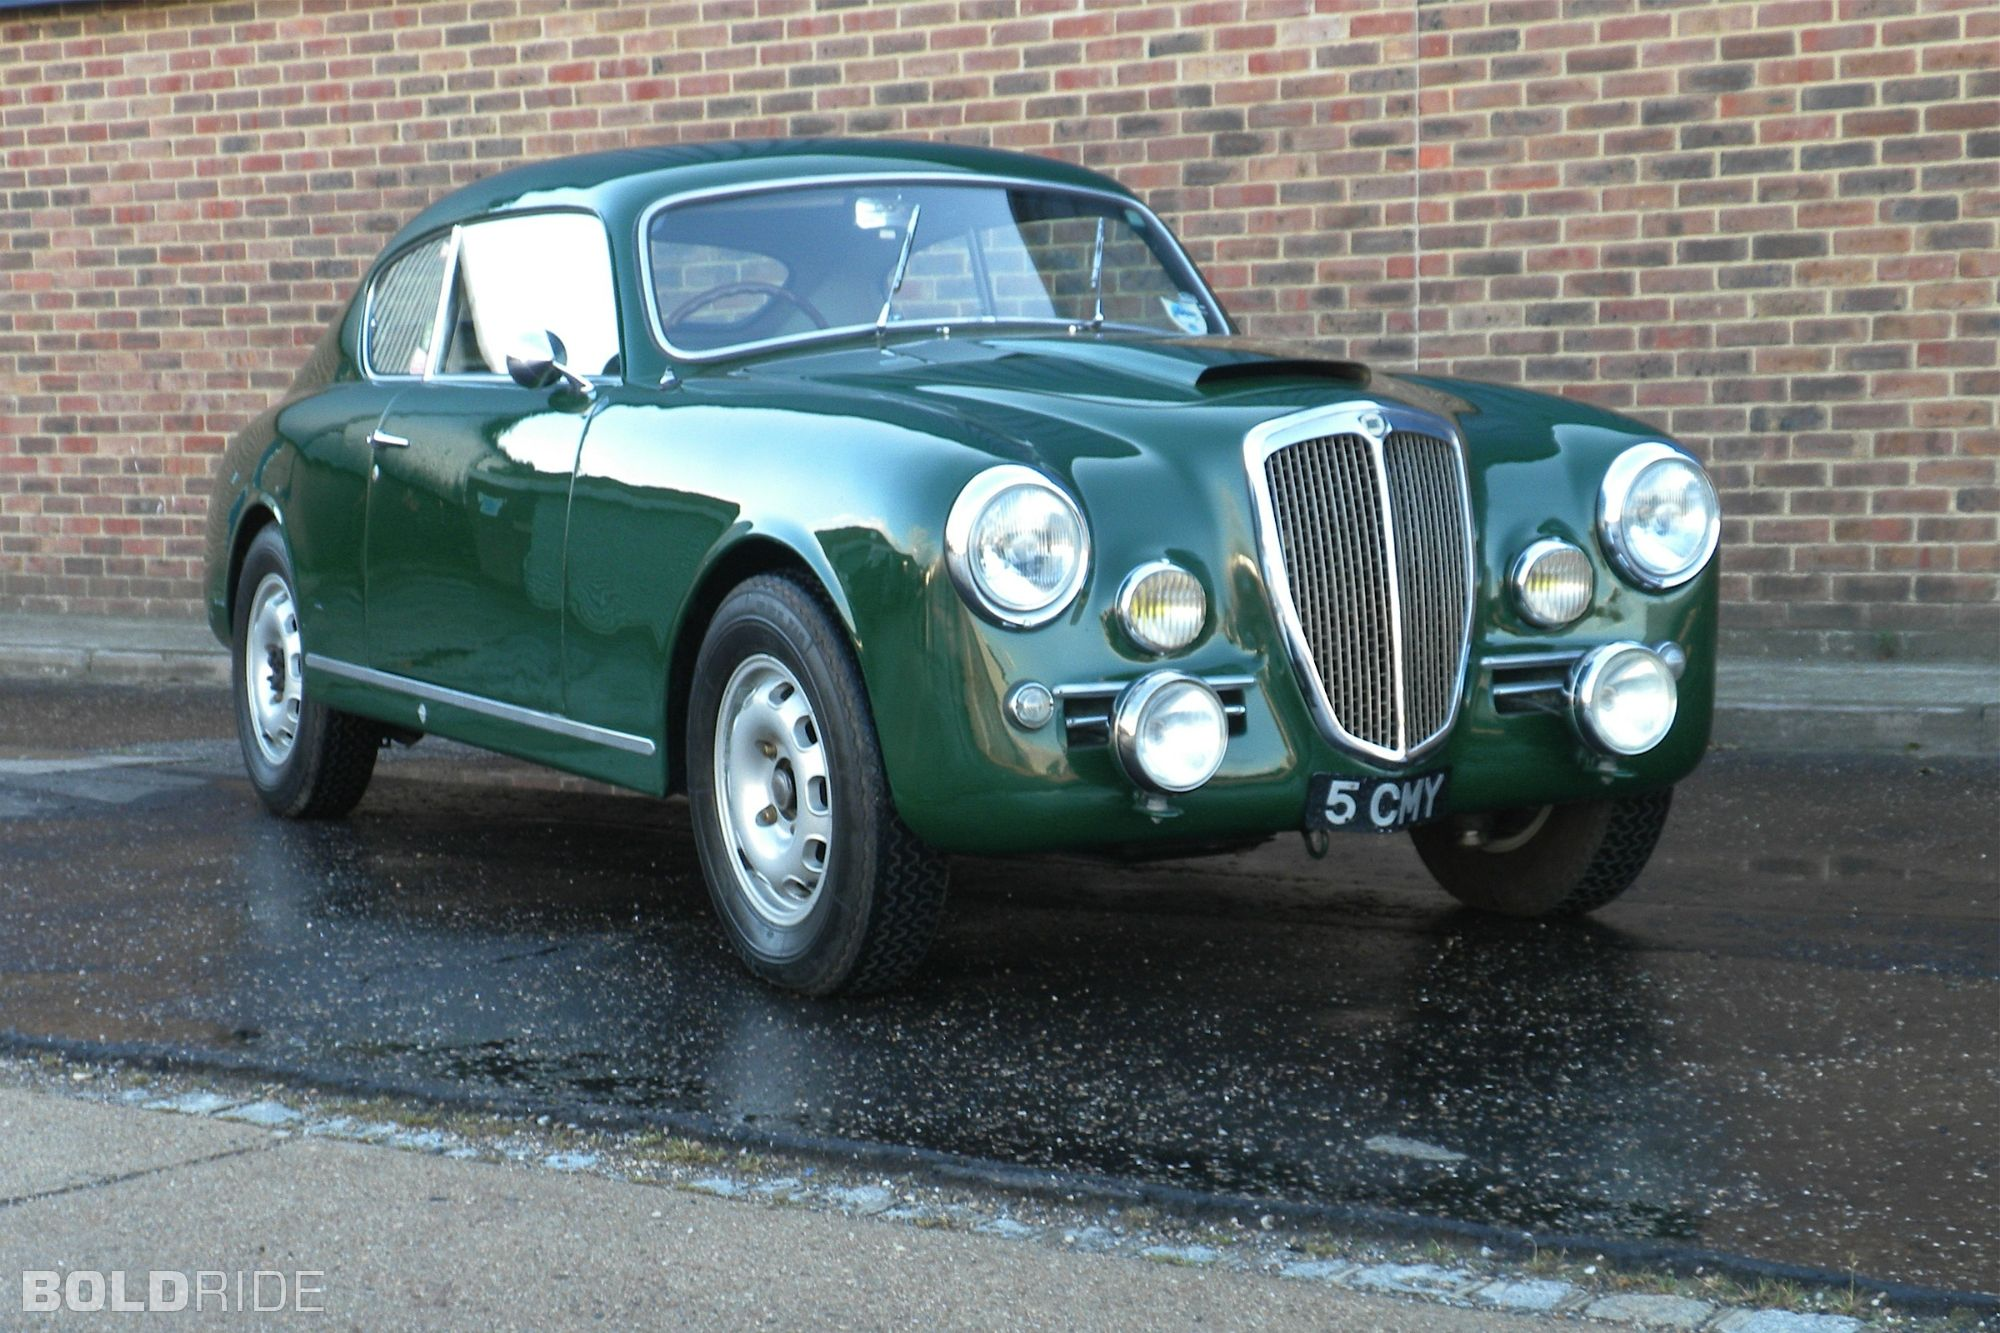 1954 lancia aurelia b20 gt coupe